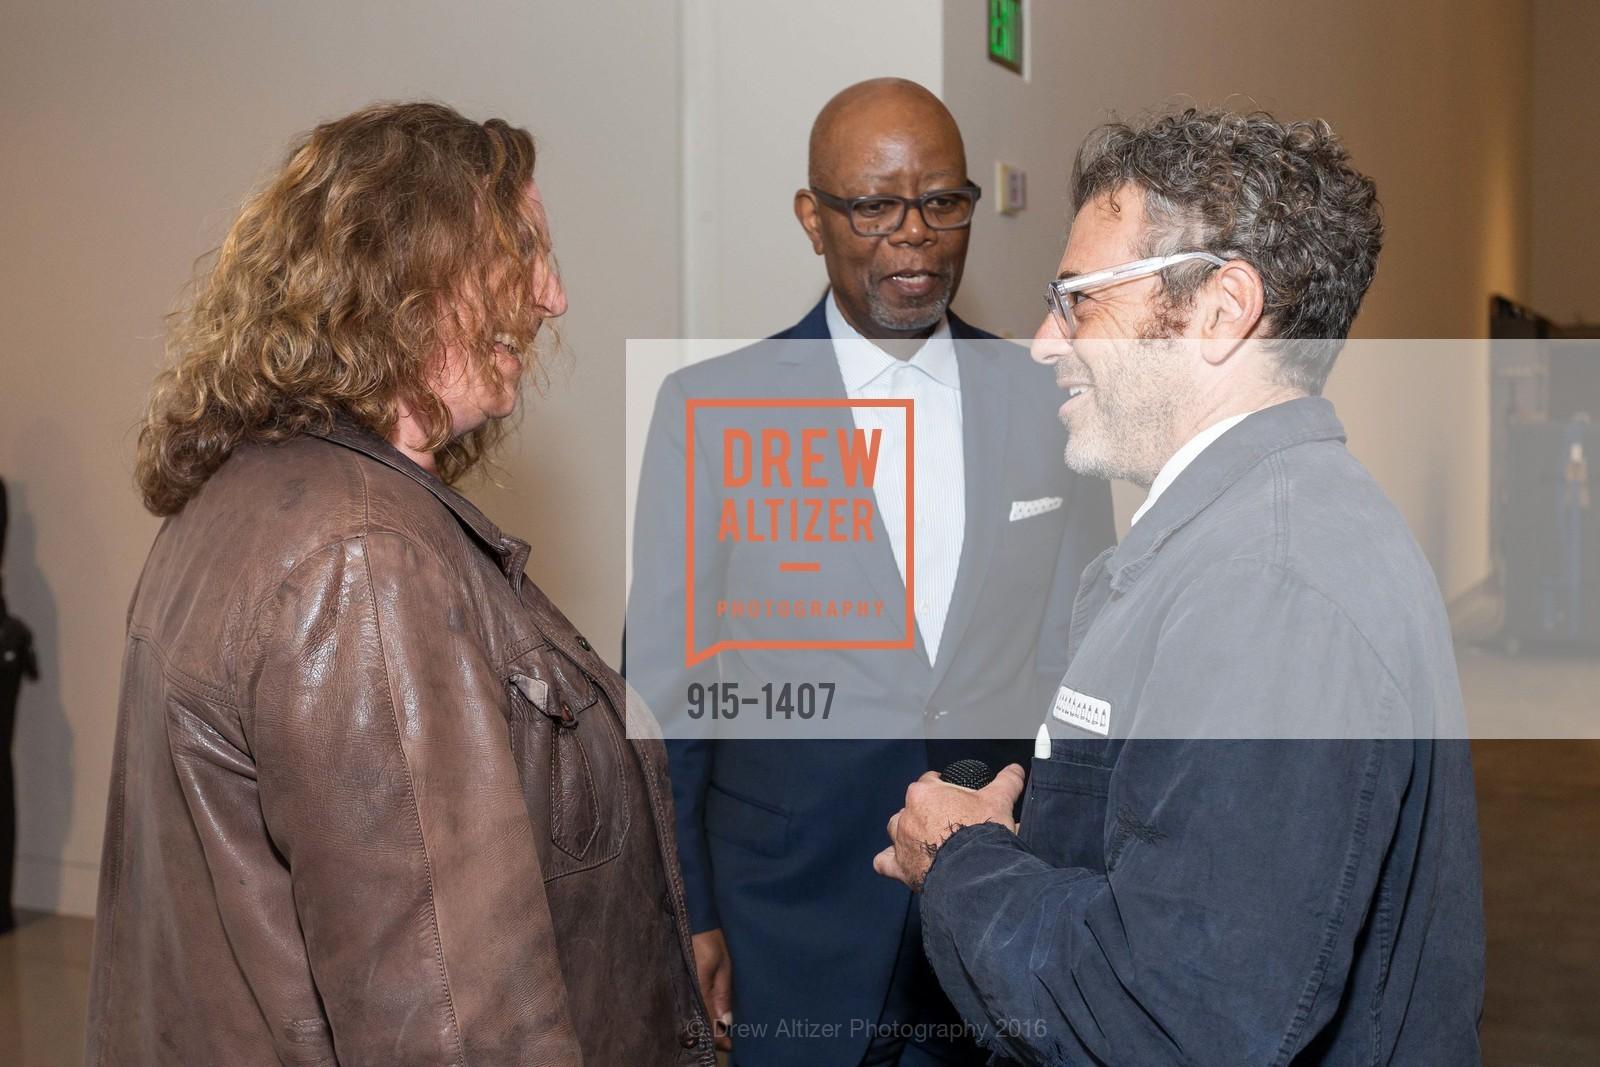 Sheila Duigman, Charles Ward, Tom Sachs, Photo #915-1407